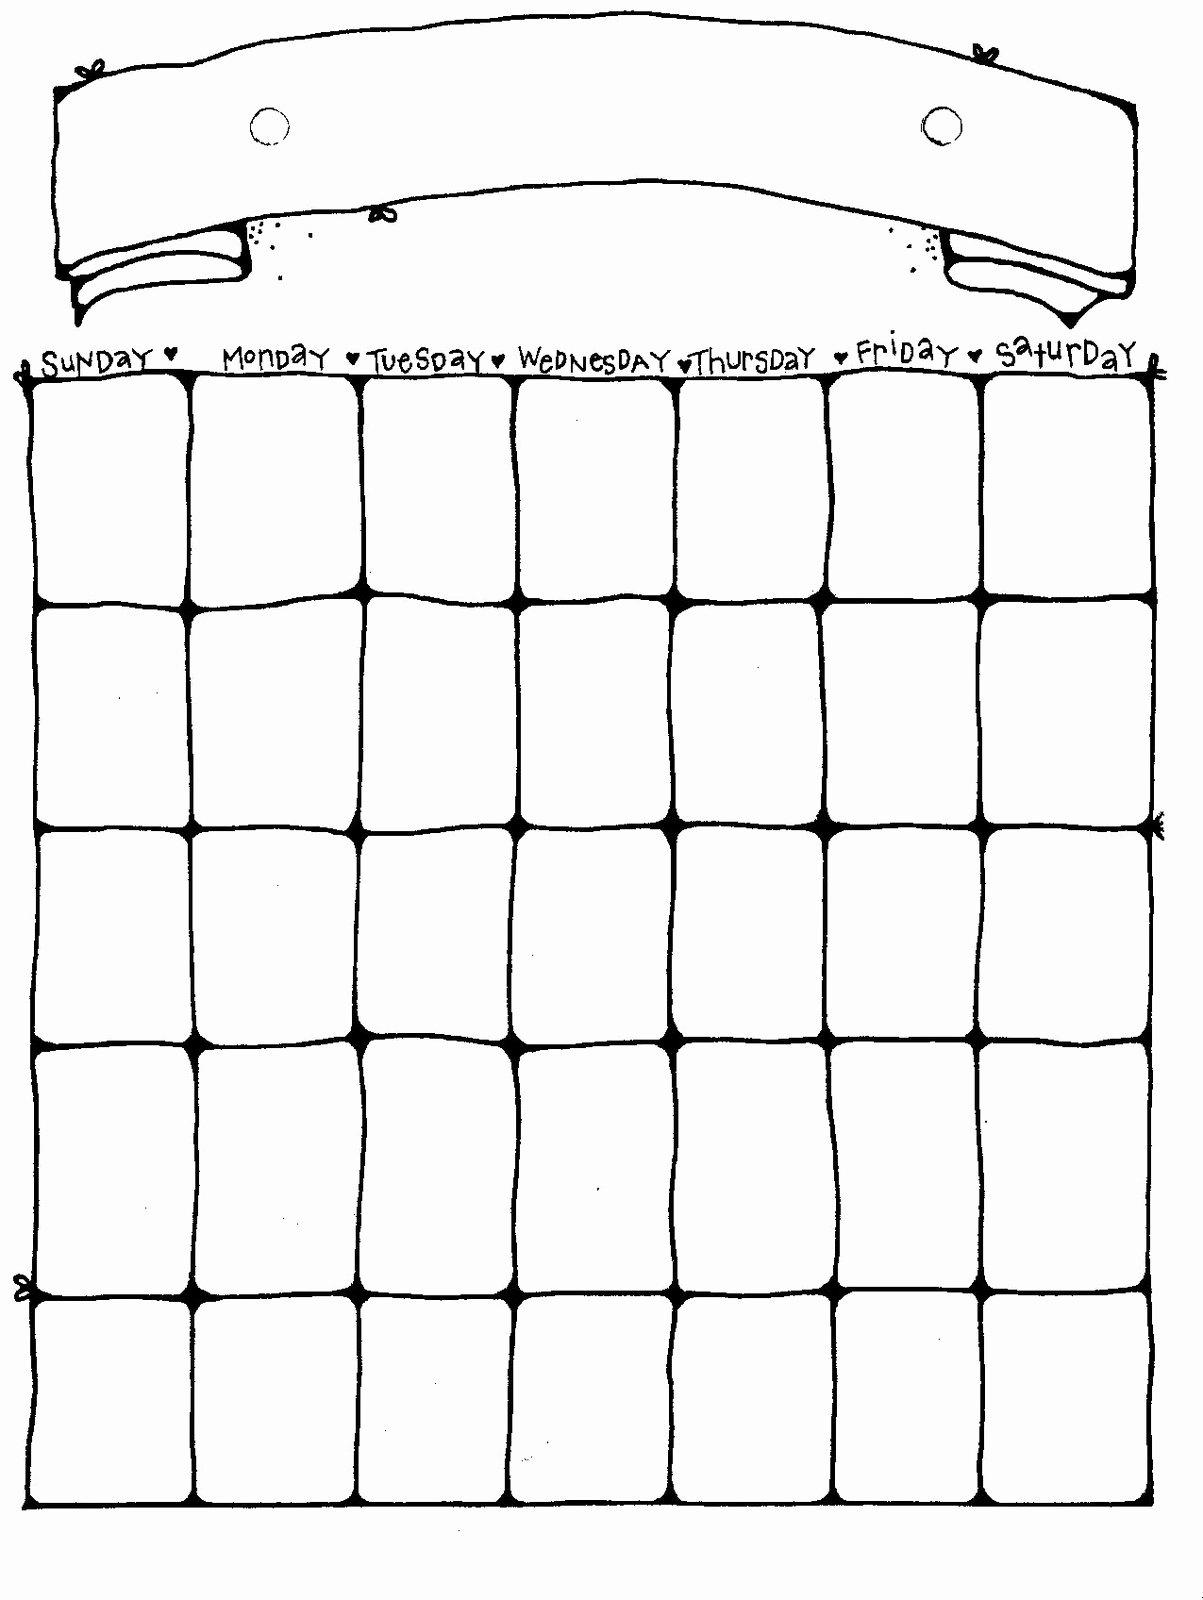 Blank Calendar for Kids Lovely 14 Blank Activity Calendar Template Printable